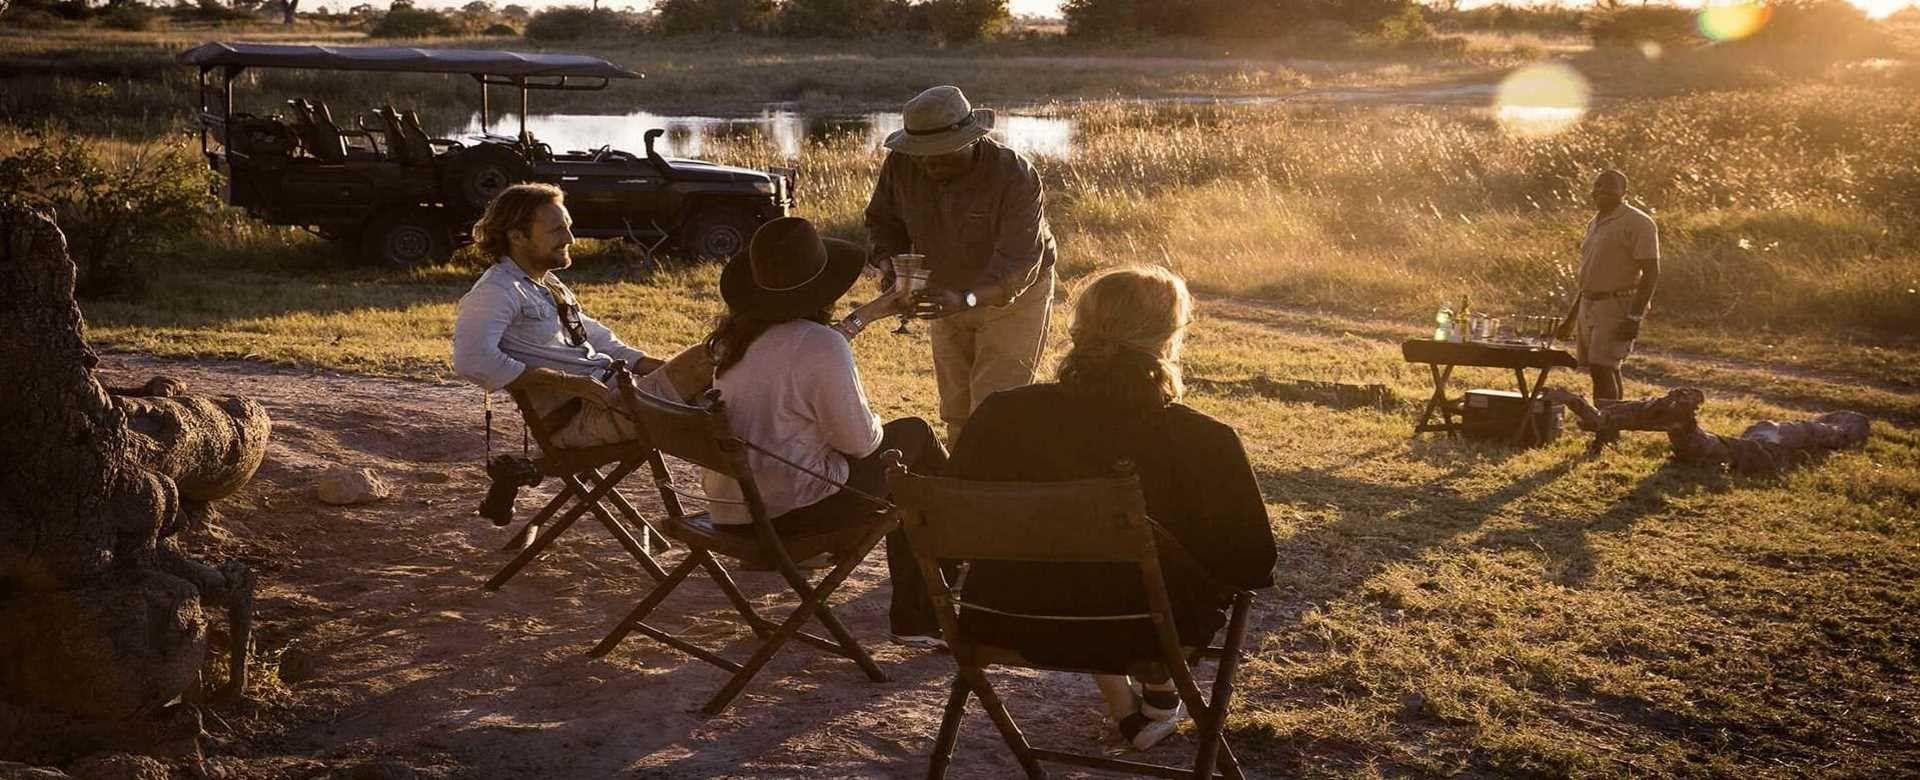 Safari Specialists - Sundowners